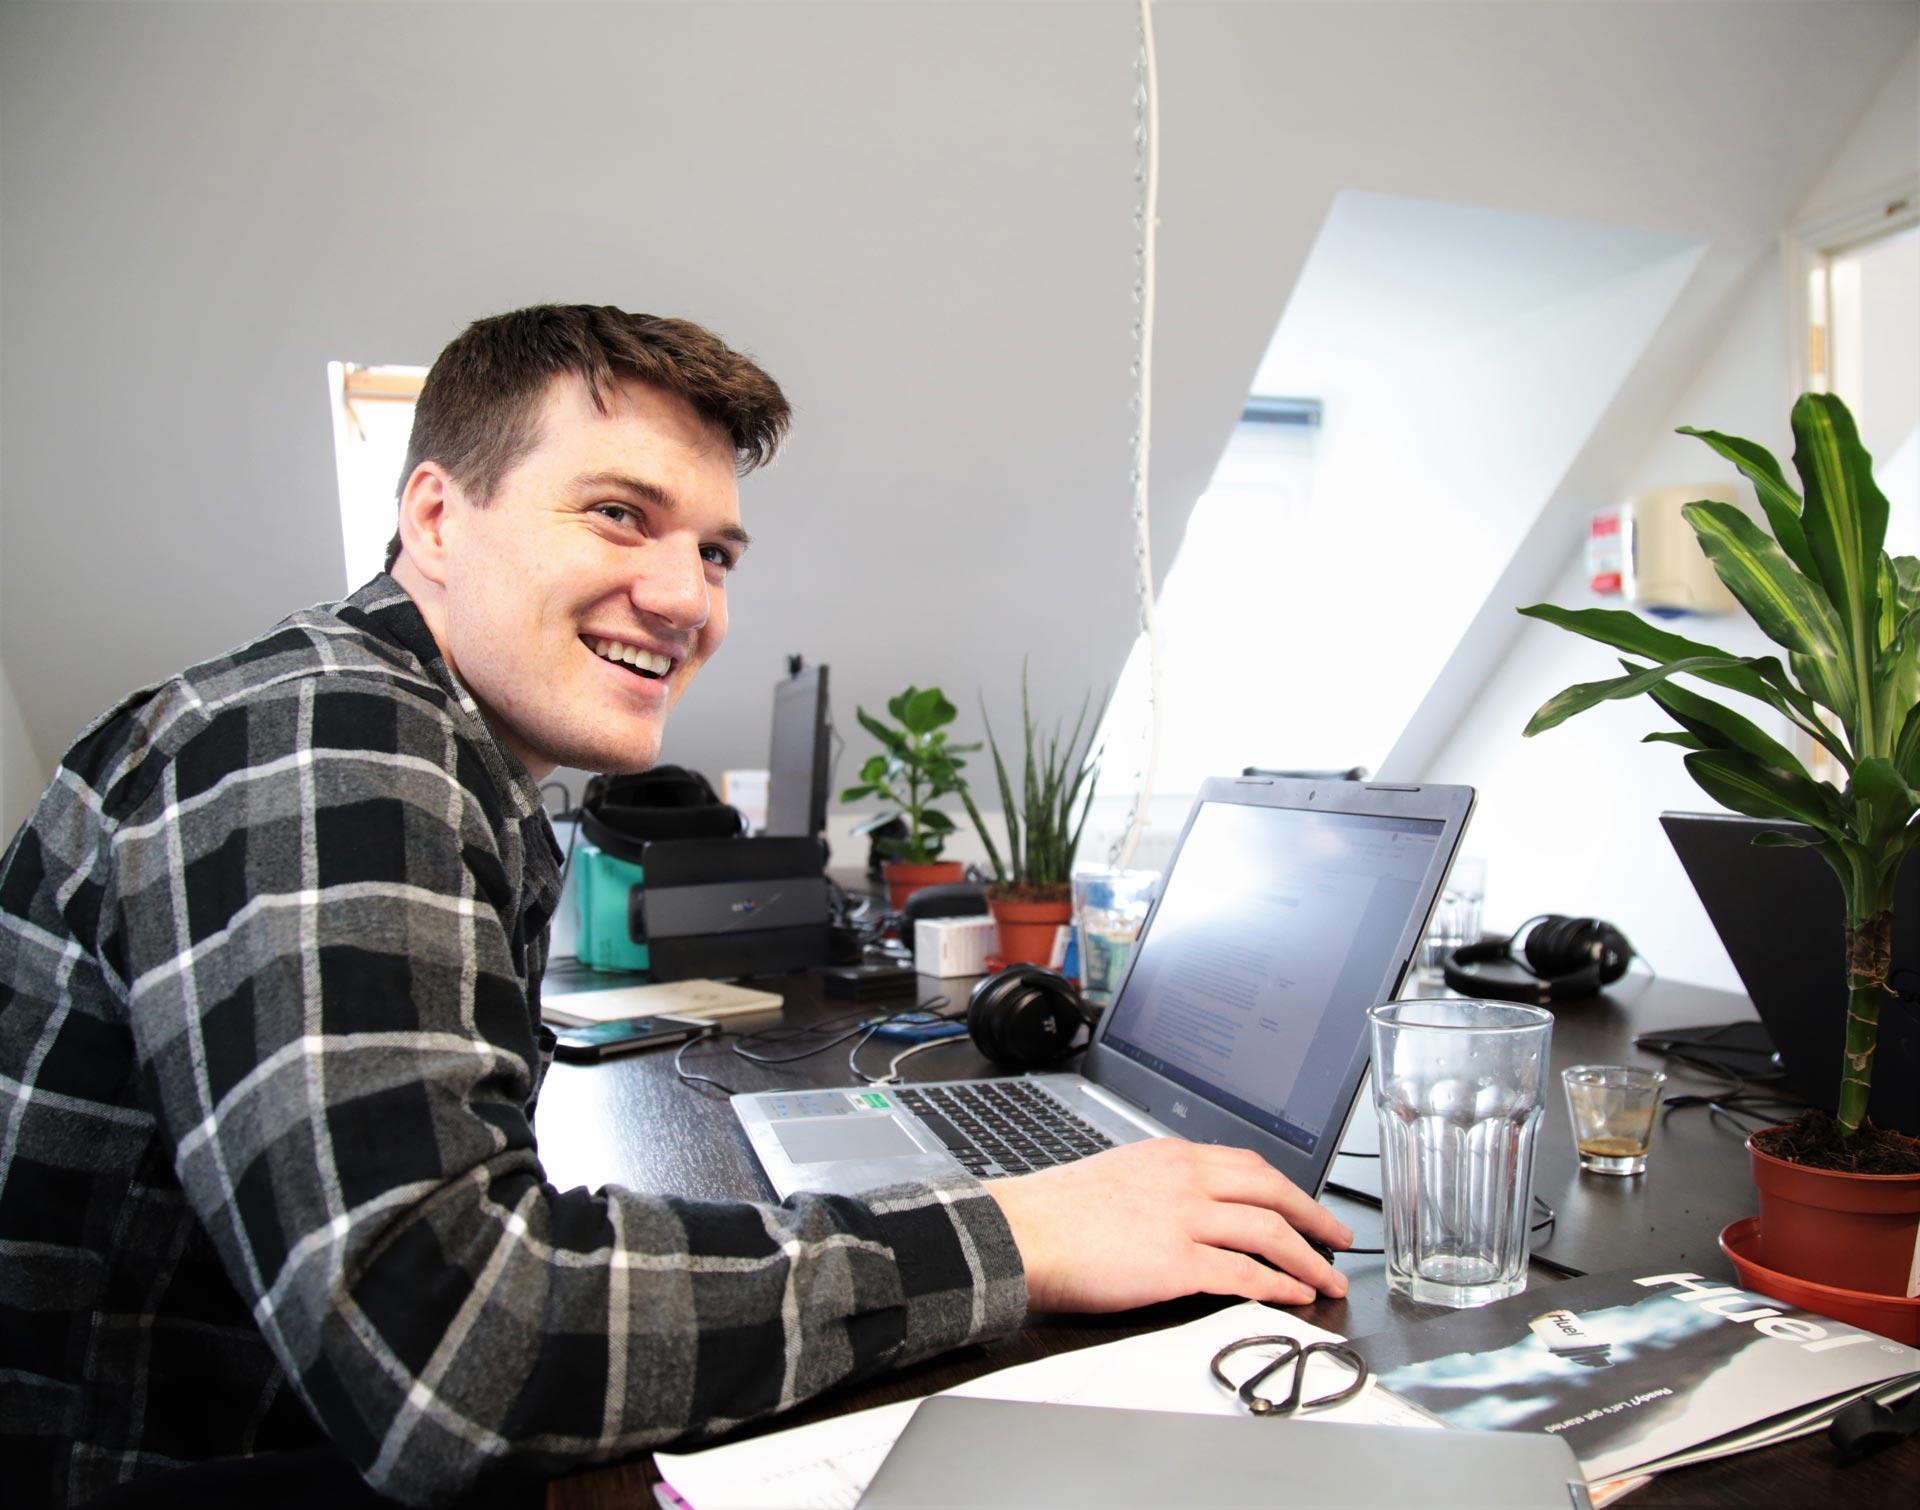 tender writer jobs and careers